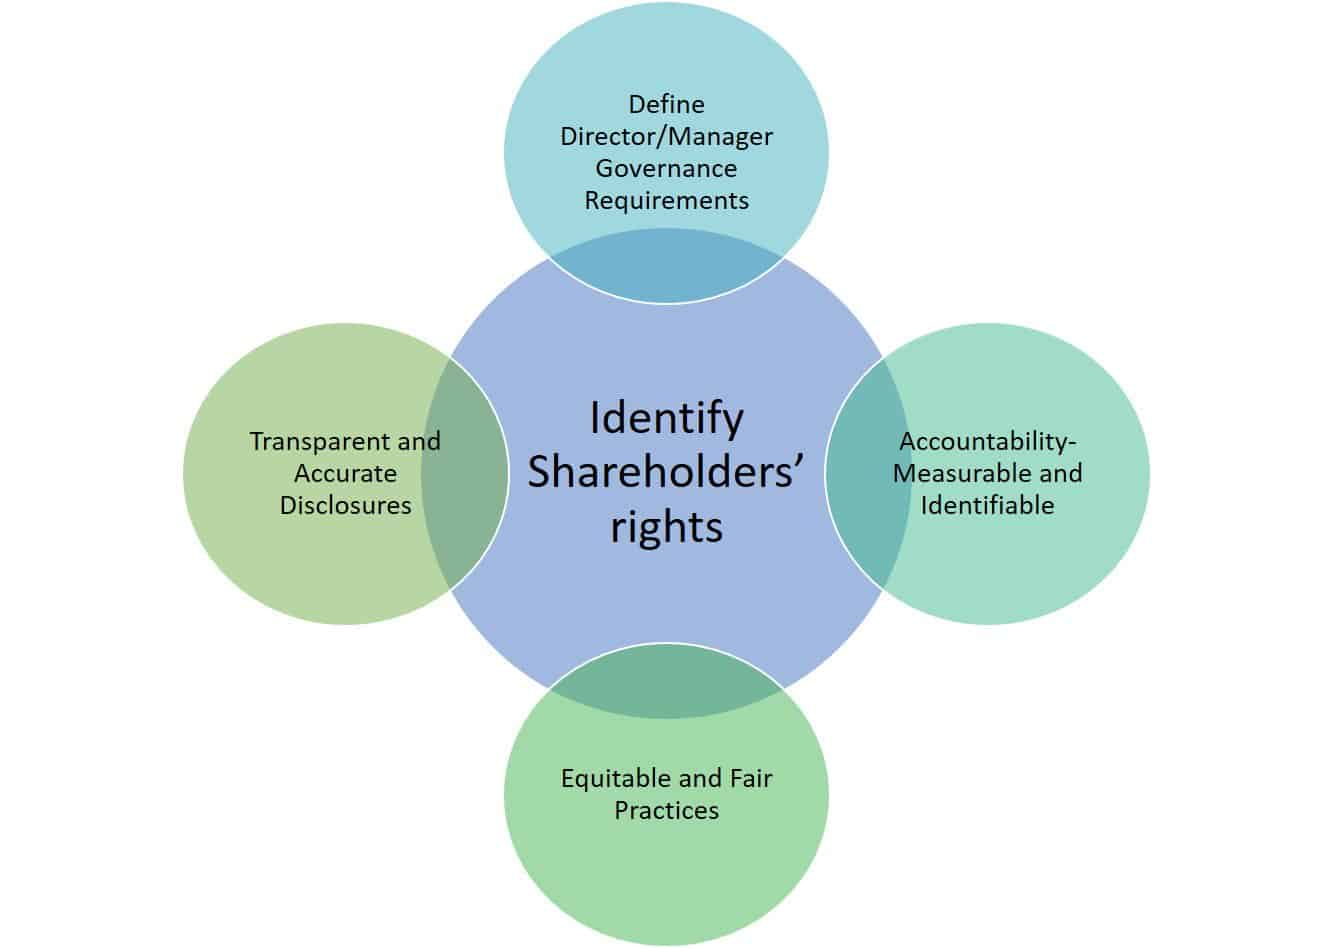 Corporate Governance For Professionals Smartsheet